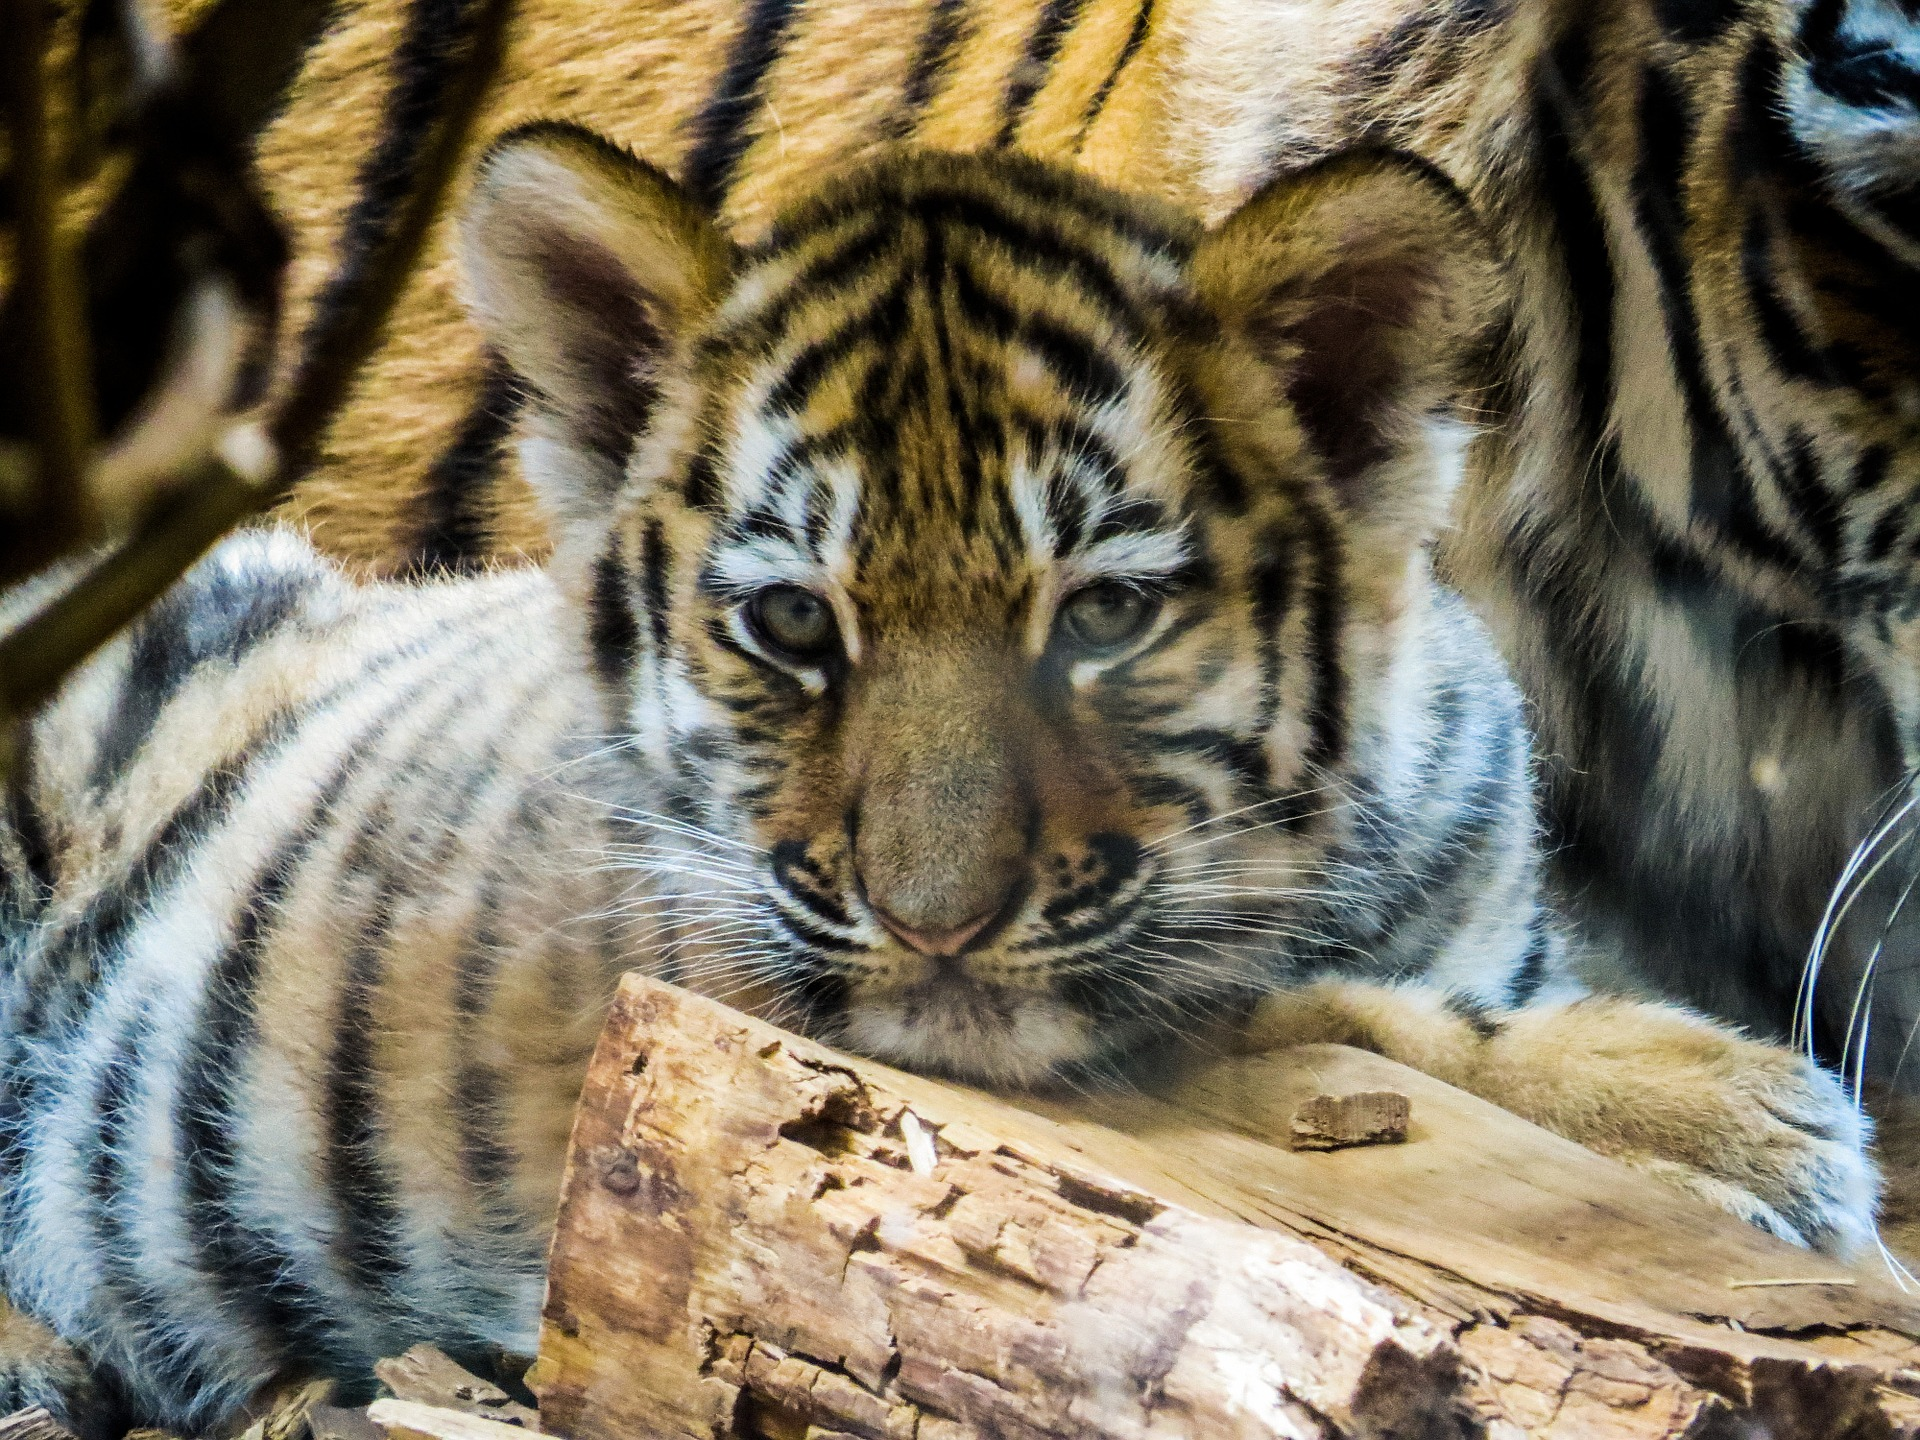 Tiger Cub, Animal, Bengal, Cub, Jungle, HQ Photo